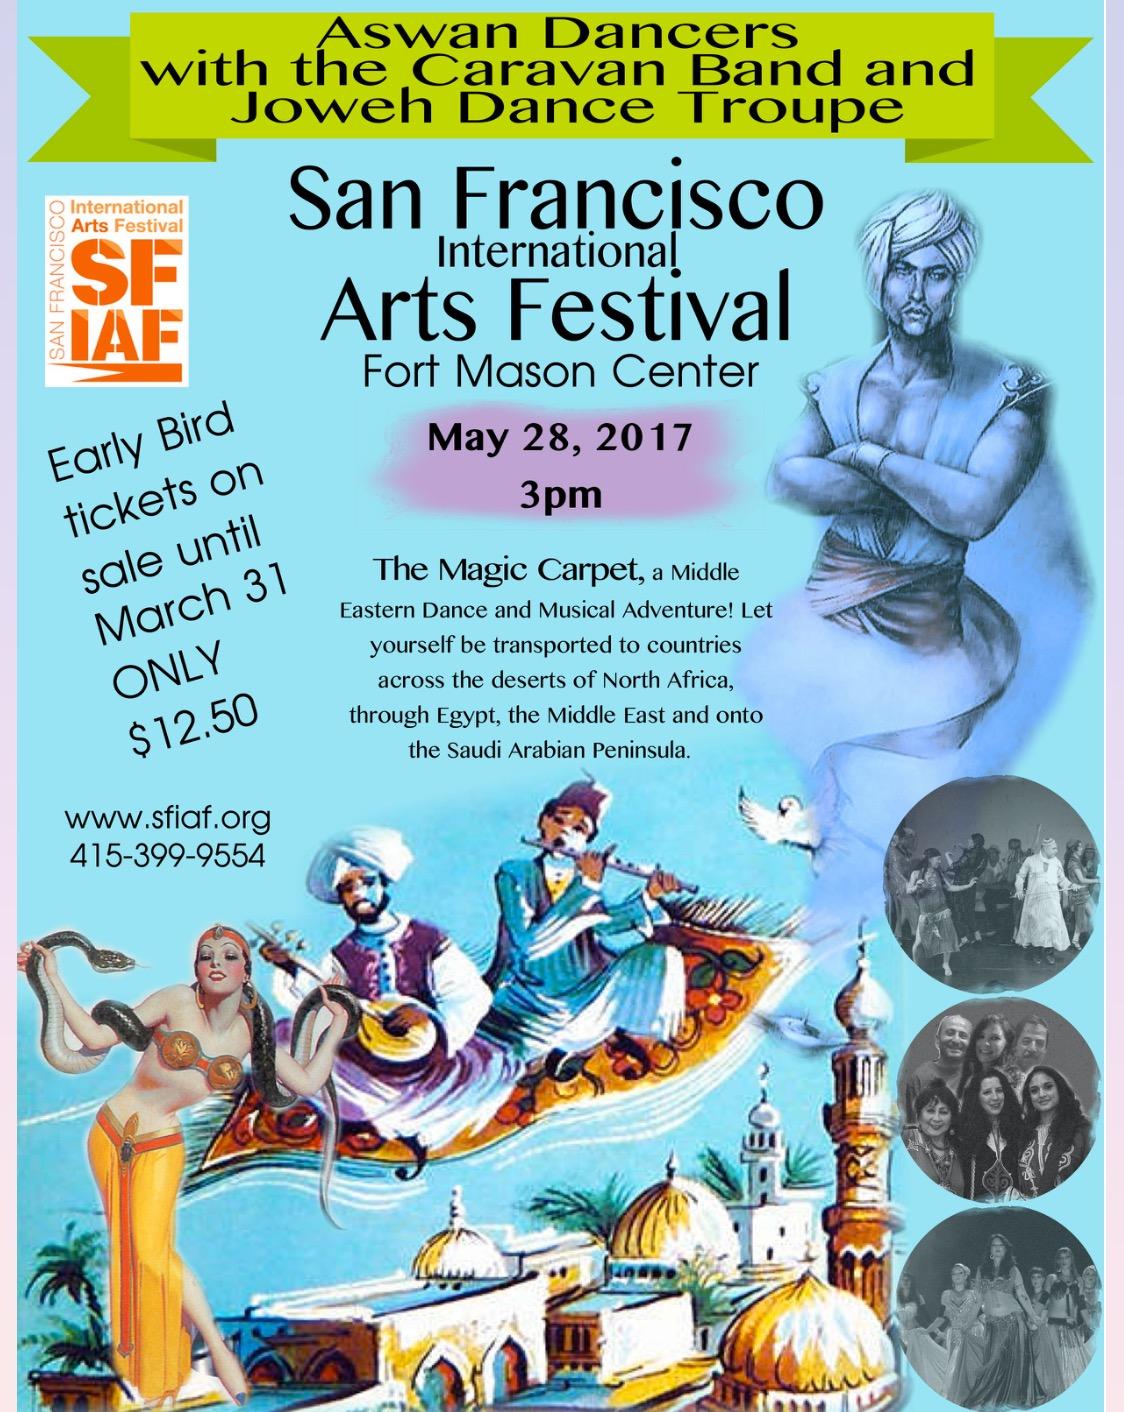 Amina Goodyear and the Aswan Dancers perform The Magic Carpet at the San Francisco International Arts Festival 2017